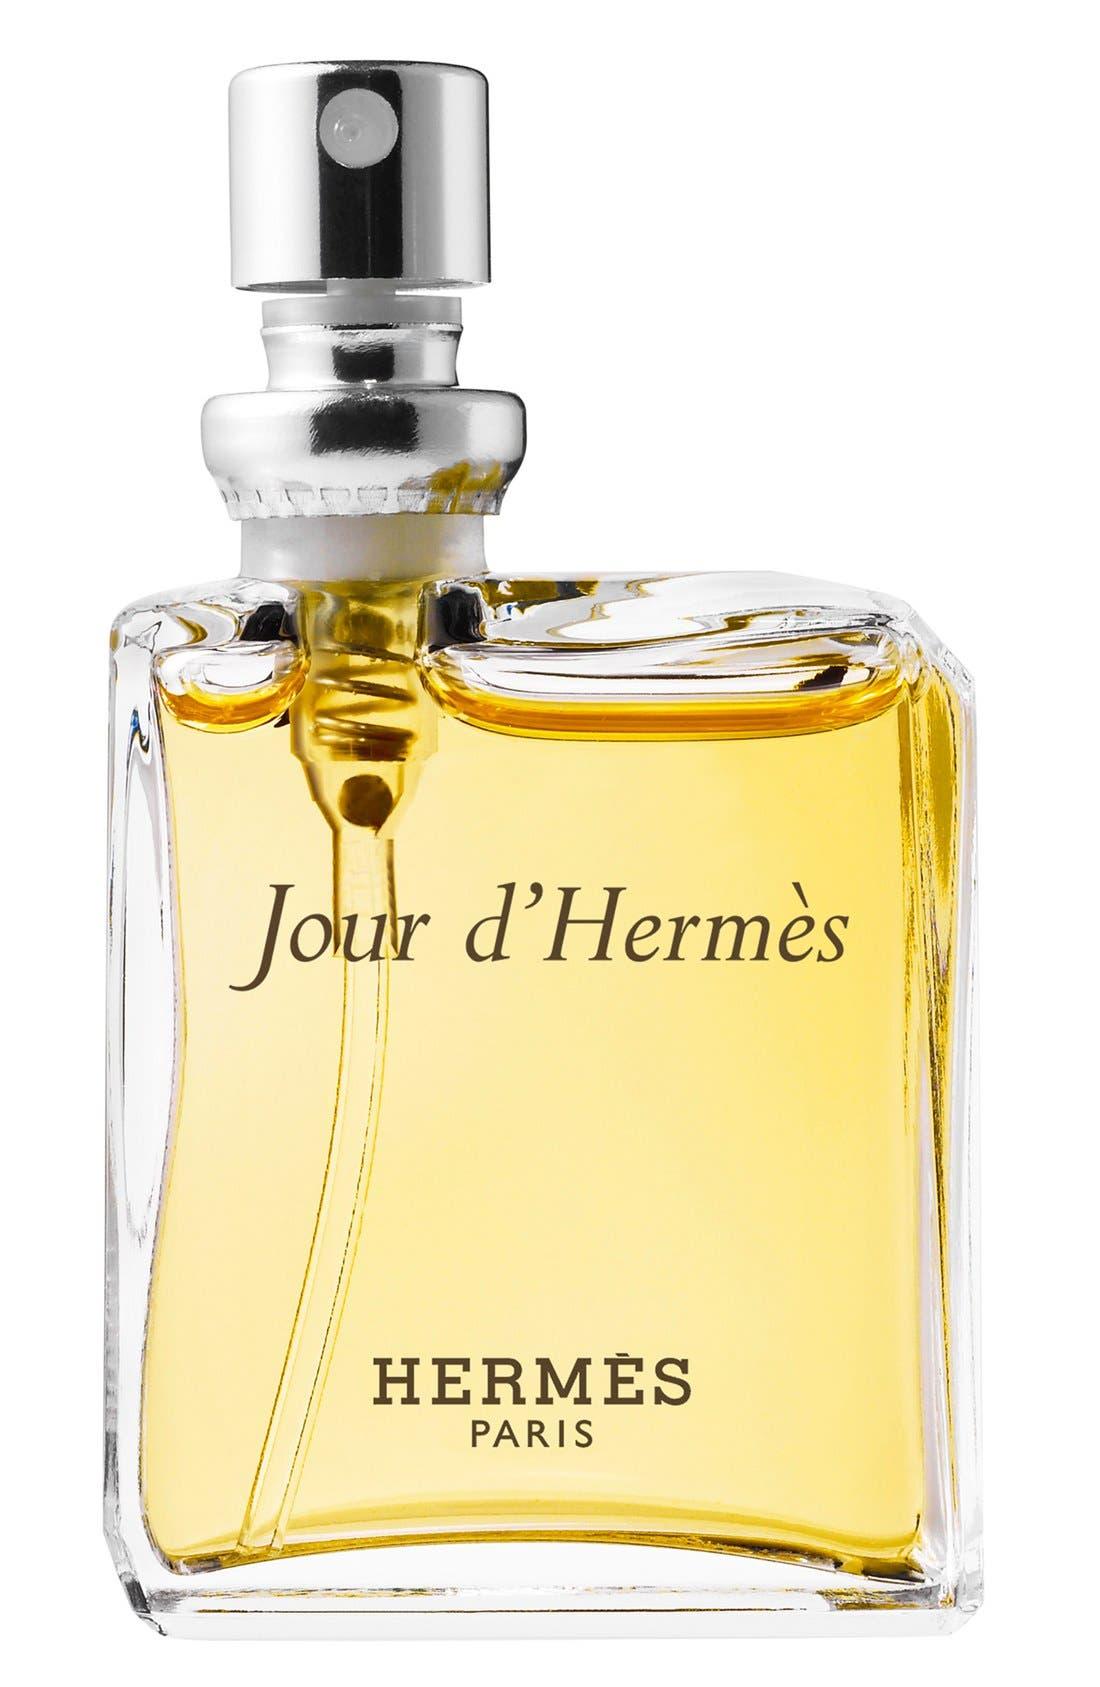 Jour d'Hermès - Pure perfume lock spray refill,                             Main thumbnail 1, color,                             NO COLOR